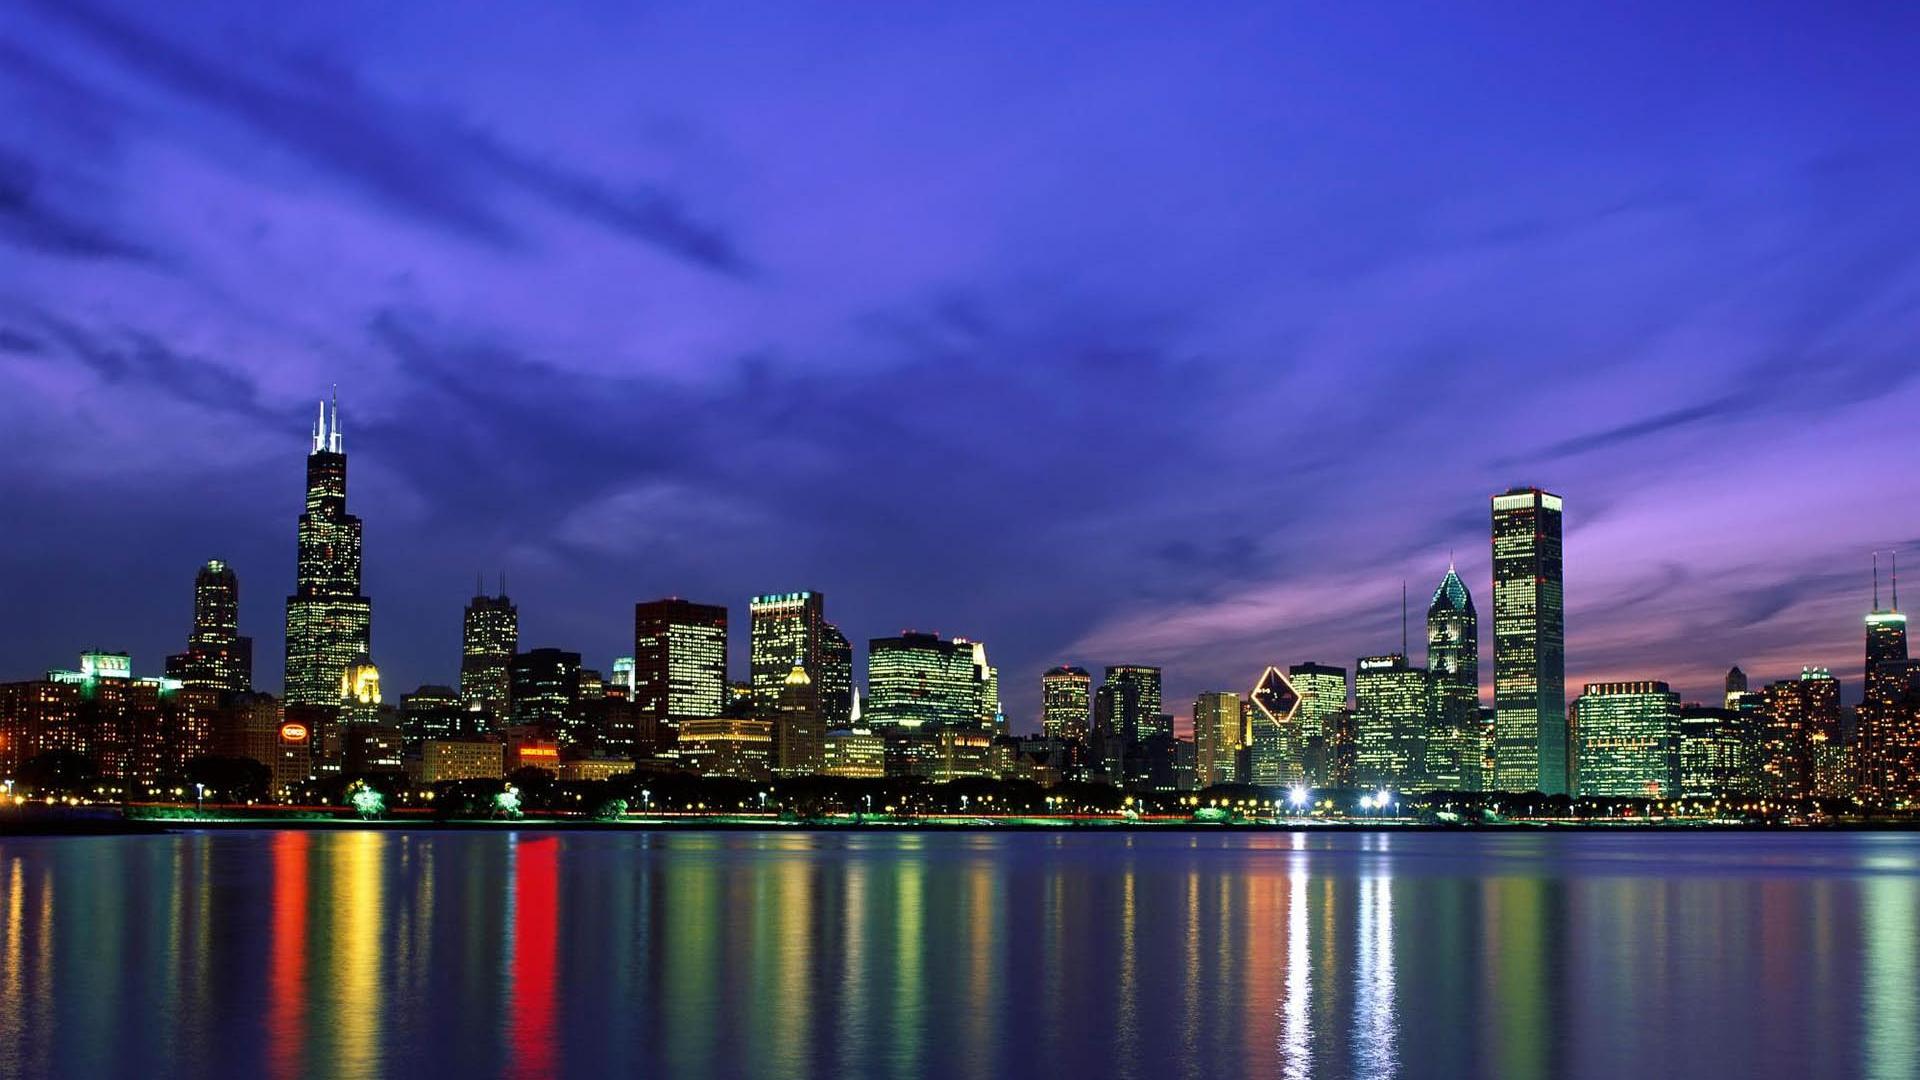 48 Chicago Skyline Desktop Wallpaper On Wallpapersafari